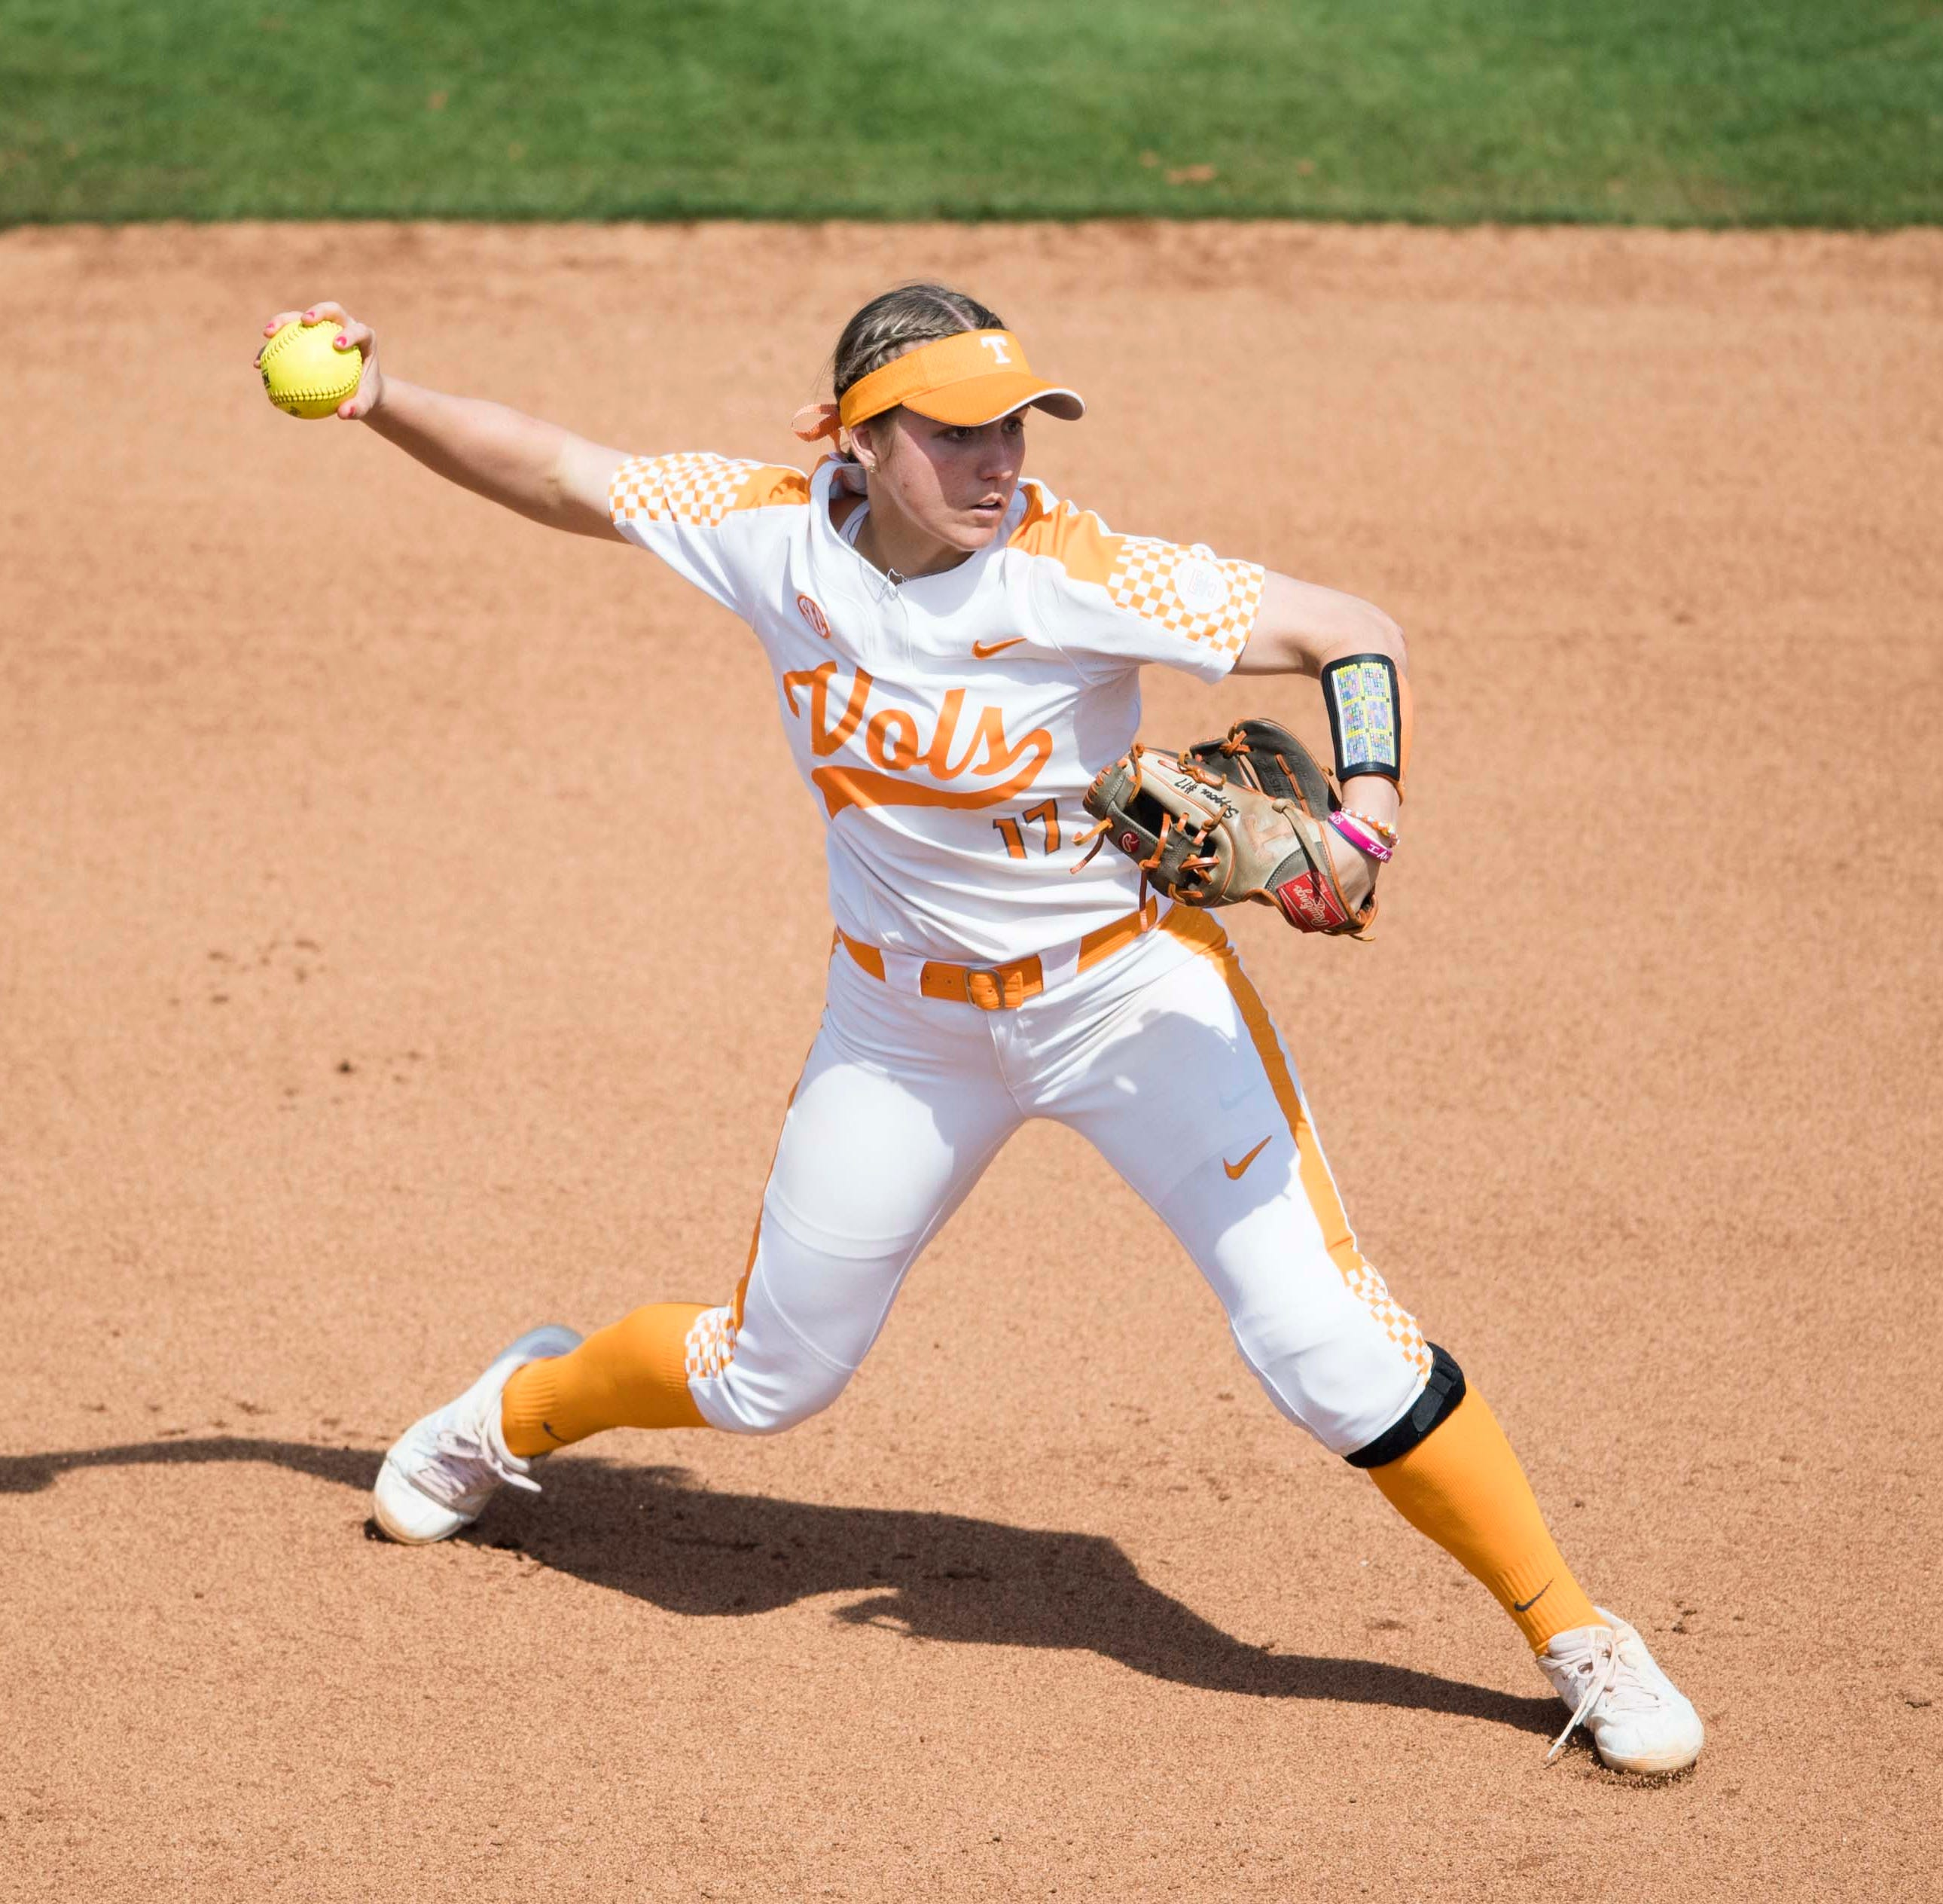 Lady Vols softball: 5 things to know entering NCAA regional